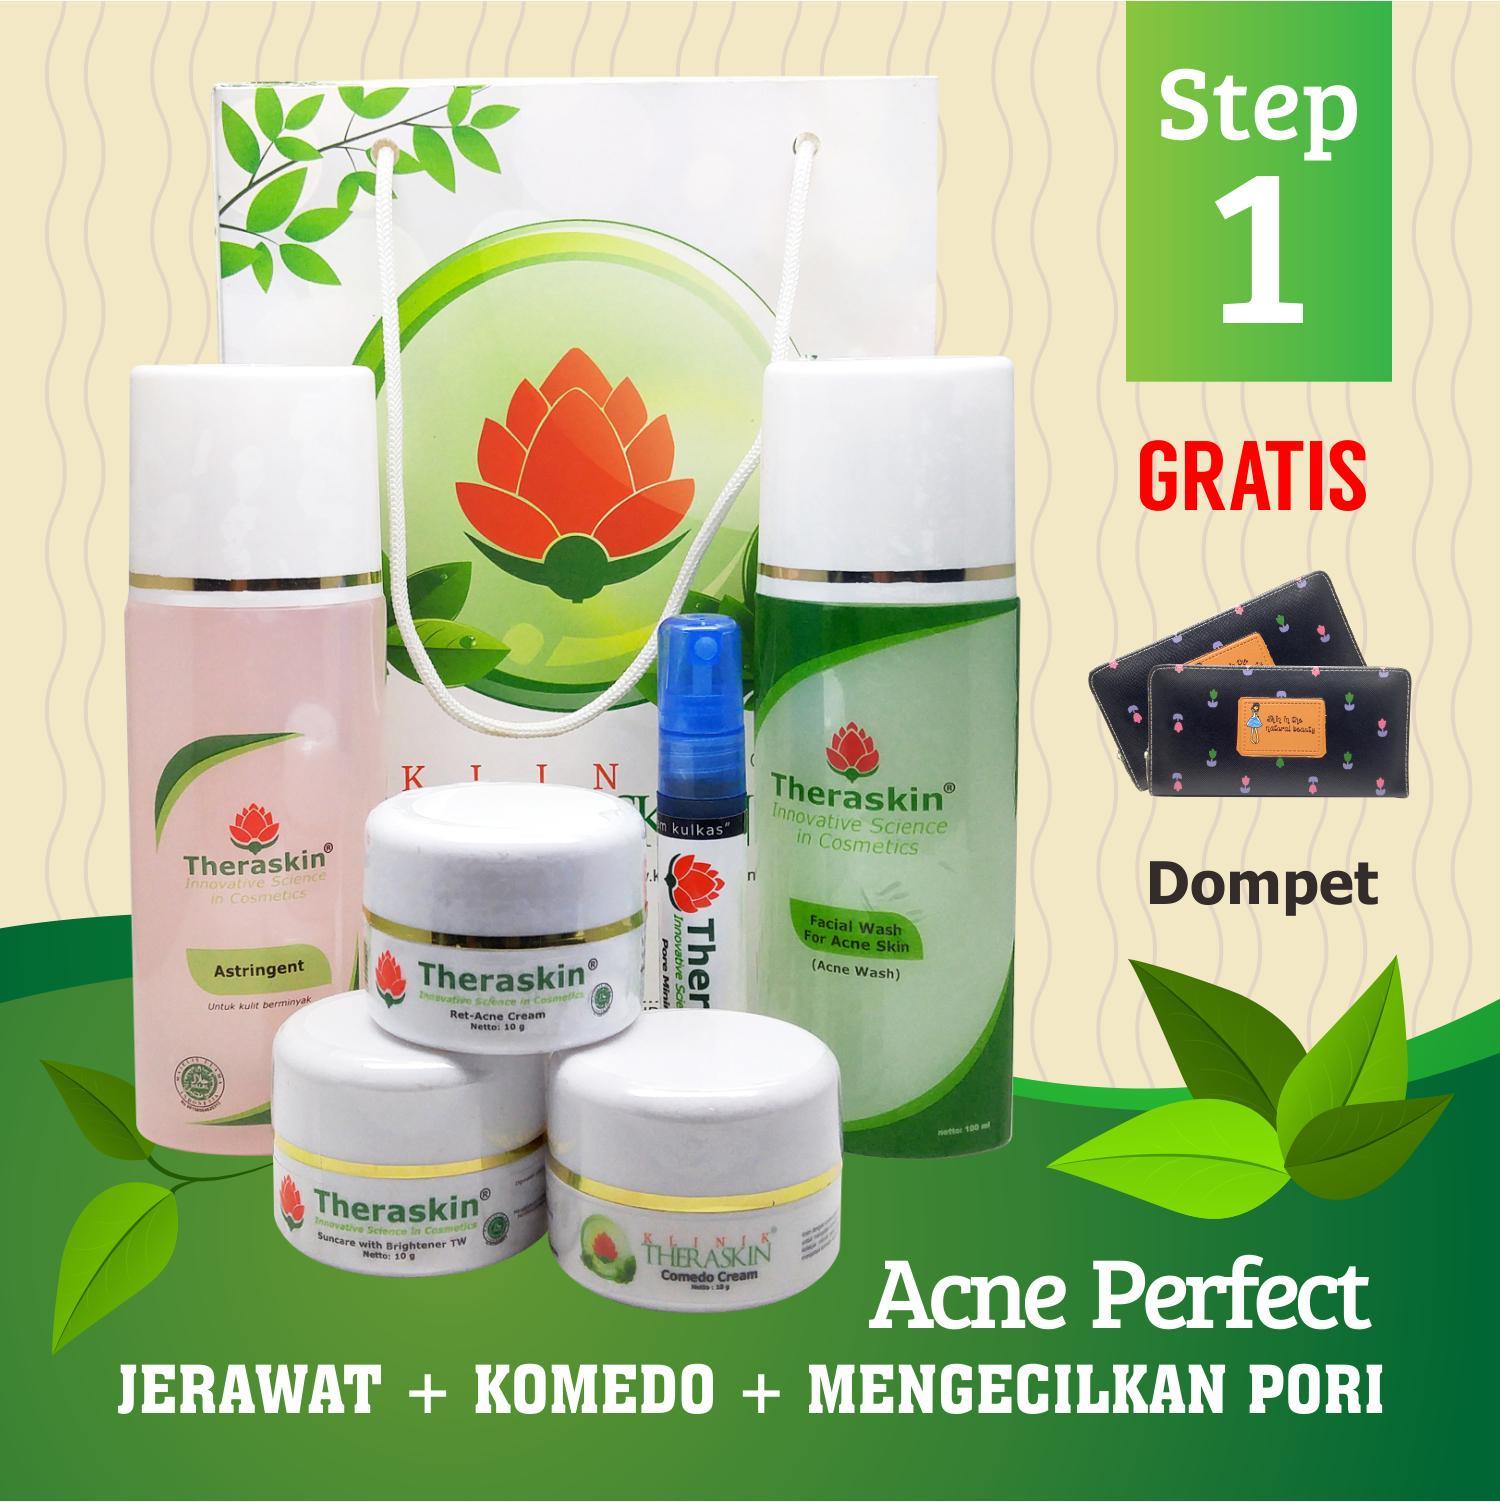 Theraskin Acne Perfect Step 1 / Paket Theraskin Jerawat + Komedo + Mengecilkan Pori - Pori + Gratis Dompet